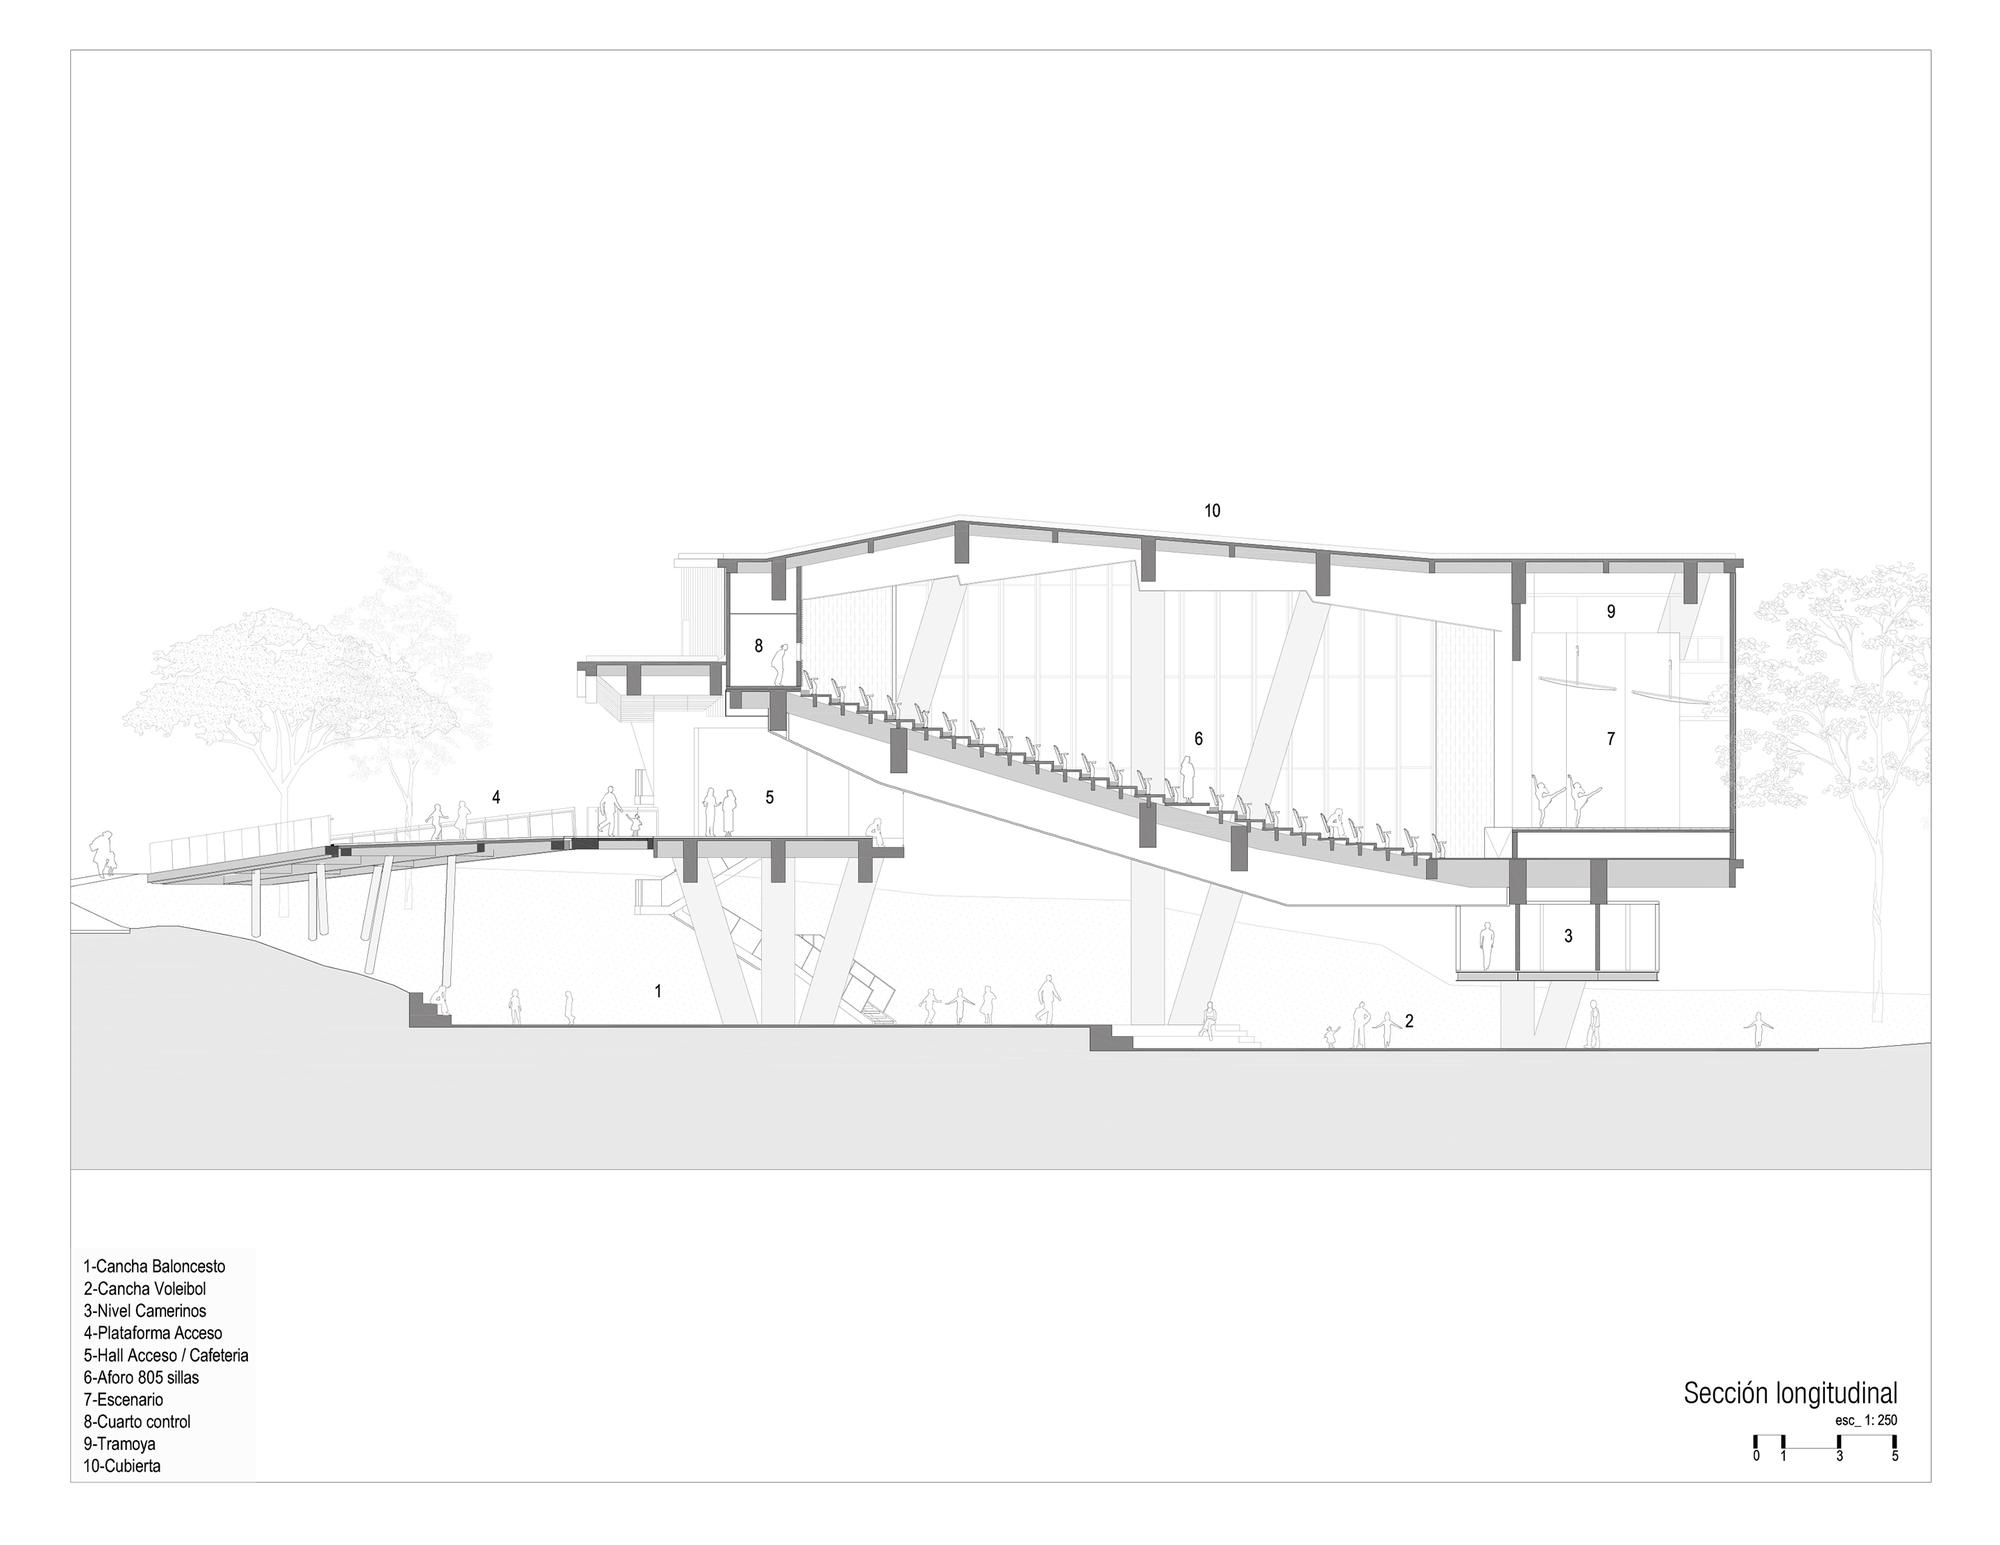 Longitudinal Plan Building